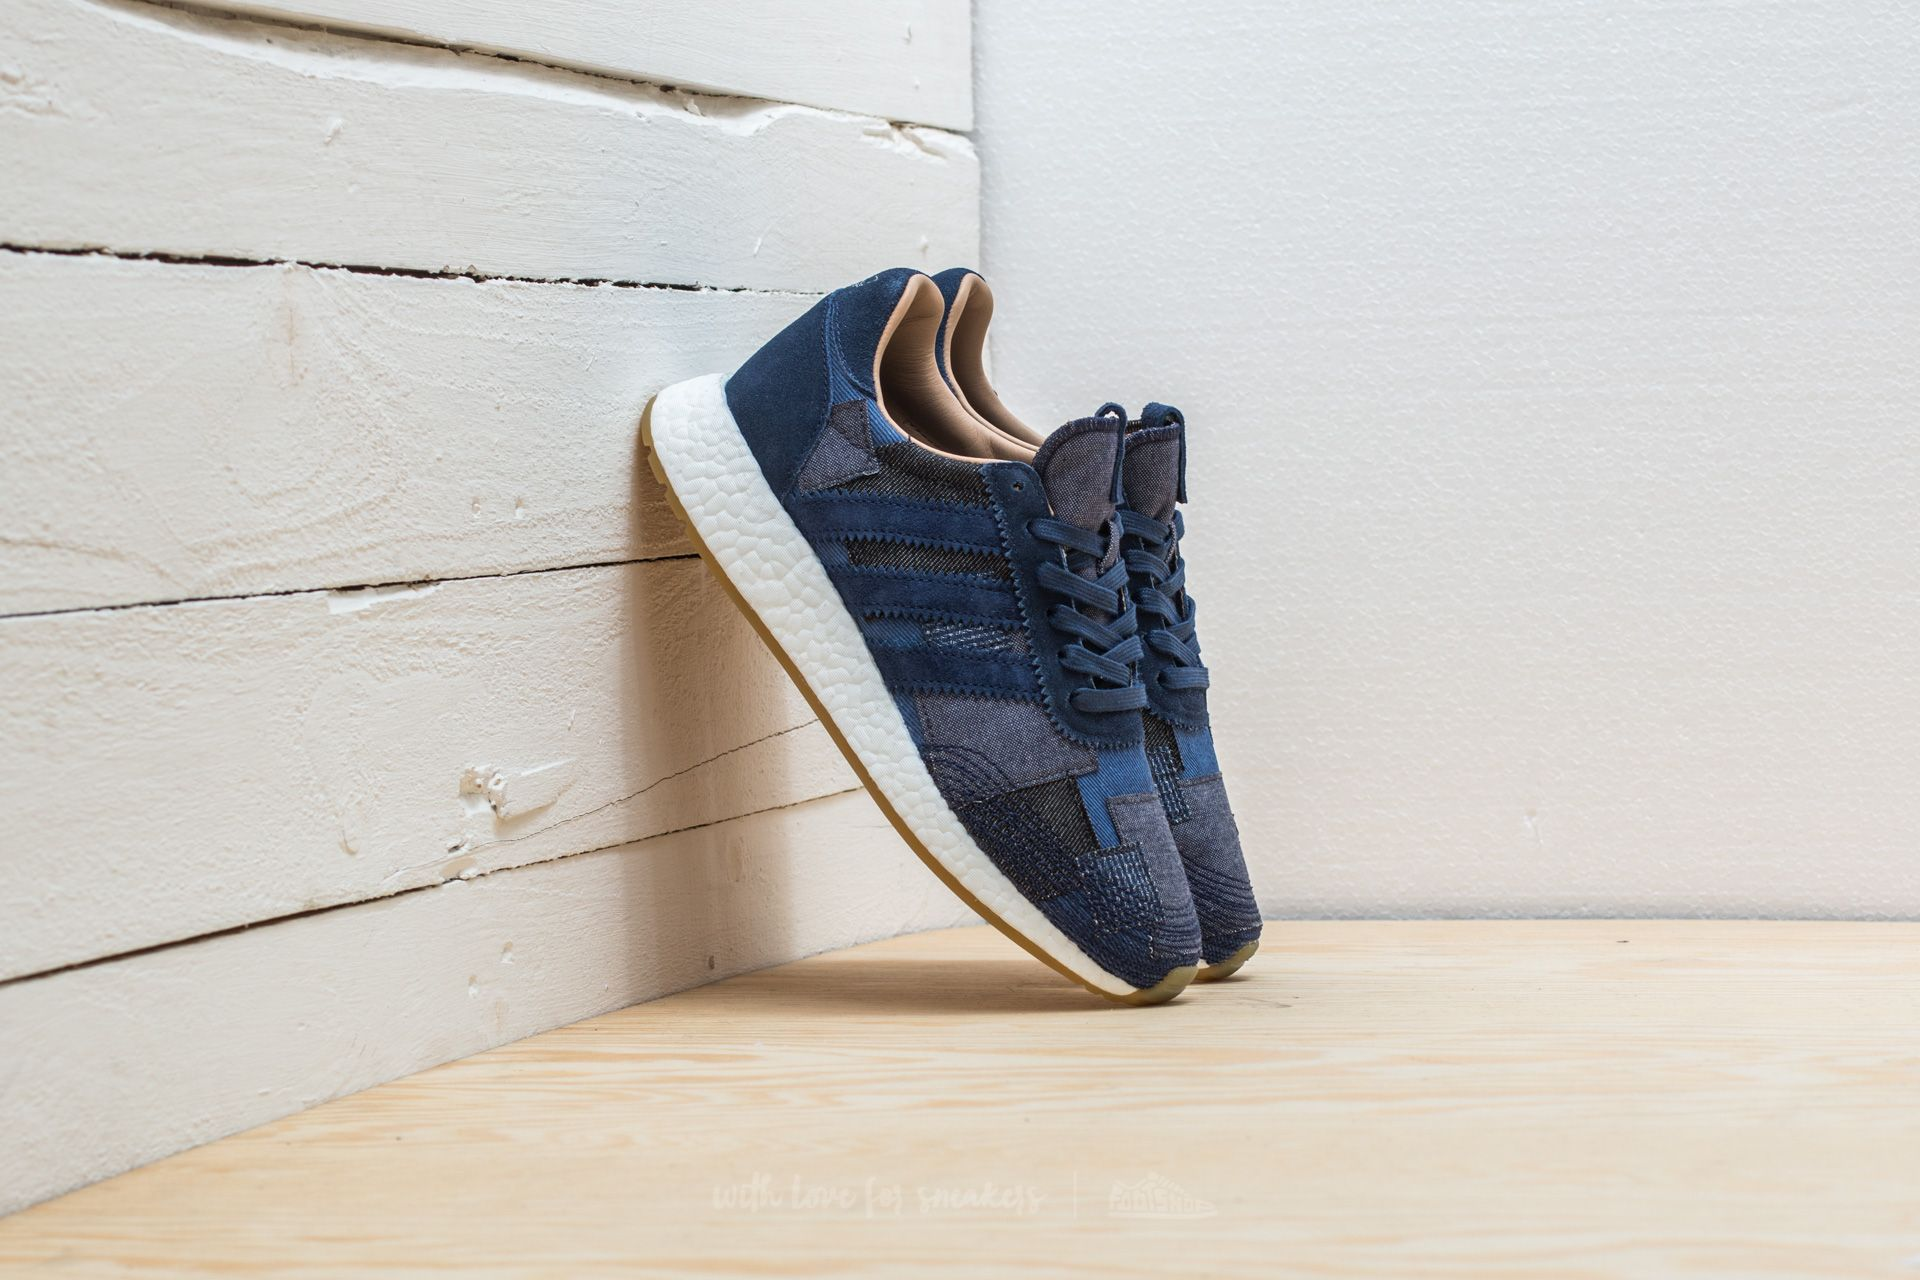 Adidas Consortium X End X Bodega Iniki Runner S.e. Blue/ Tan